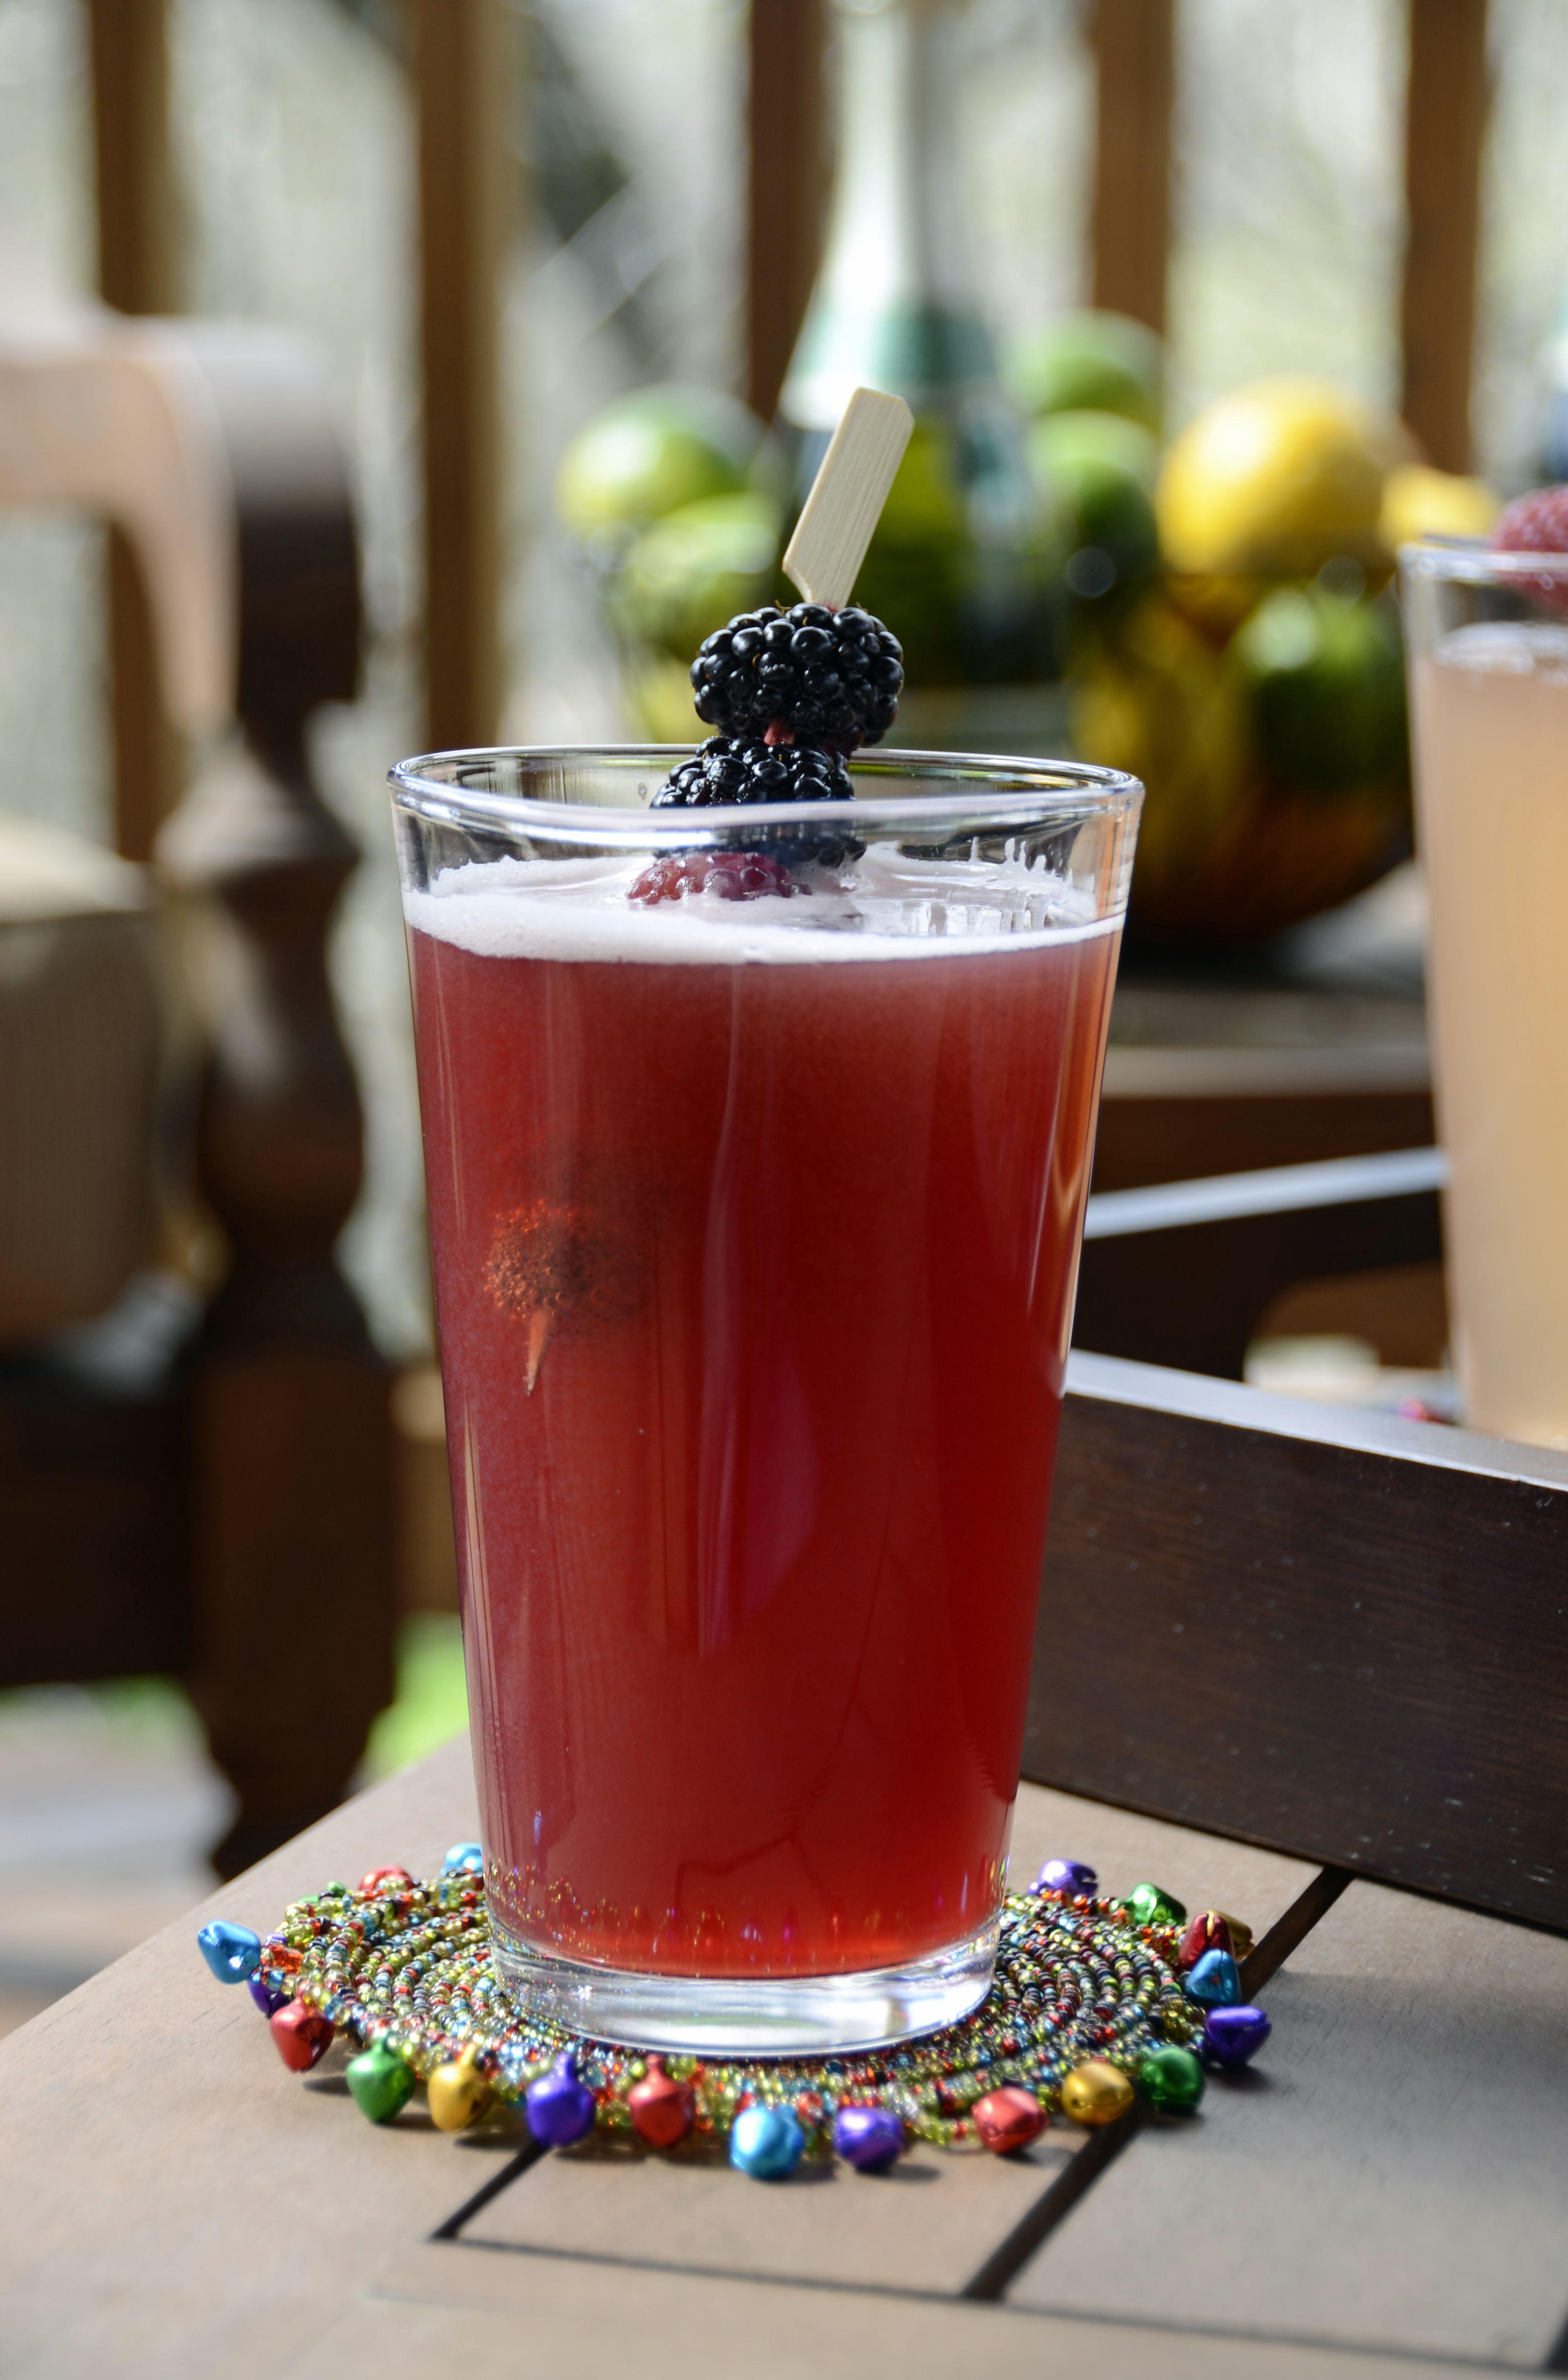 Blueberry Pomegranate Moscato Spumante Ale Pomegranate Blueberry Wines